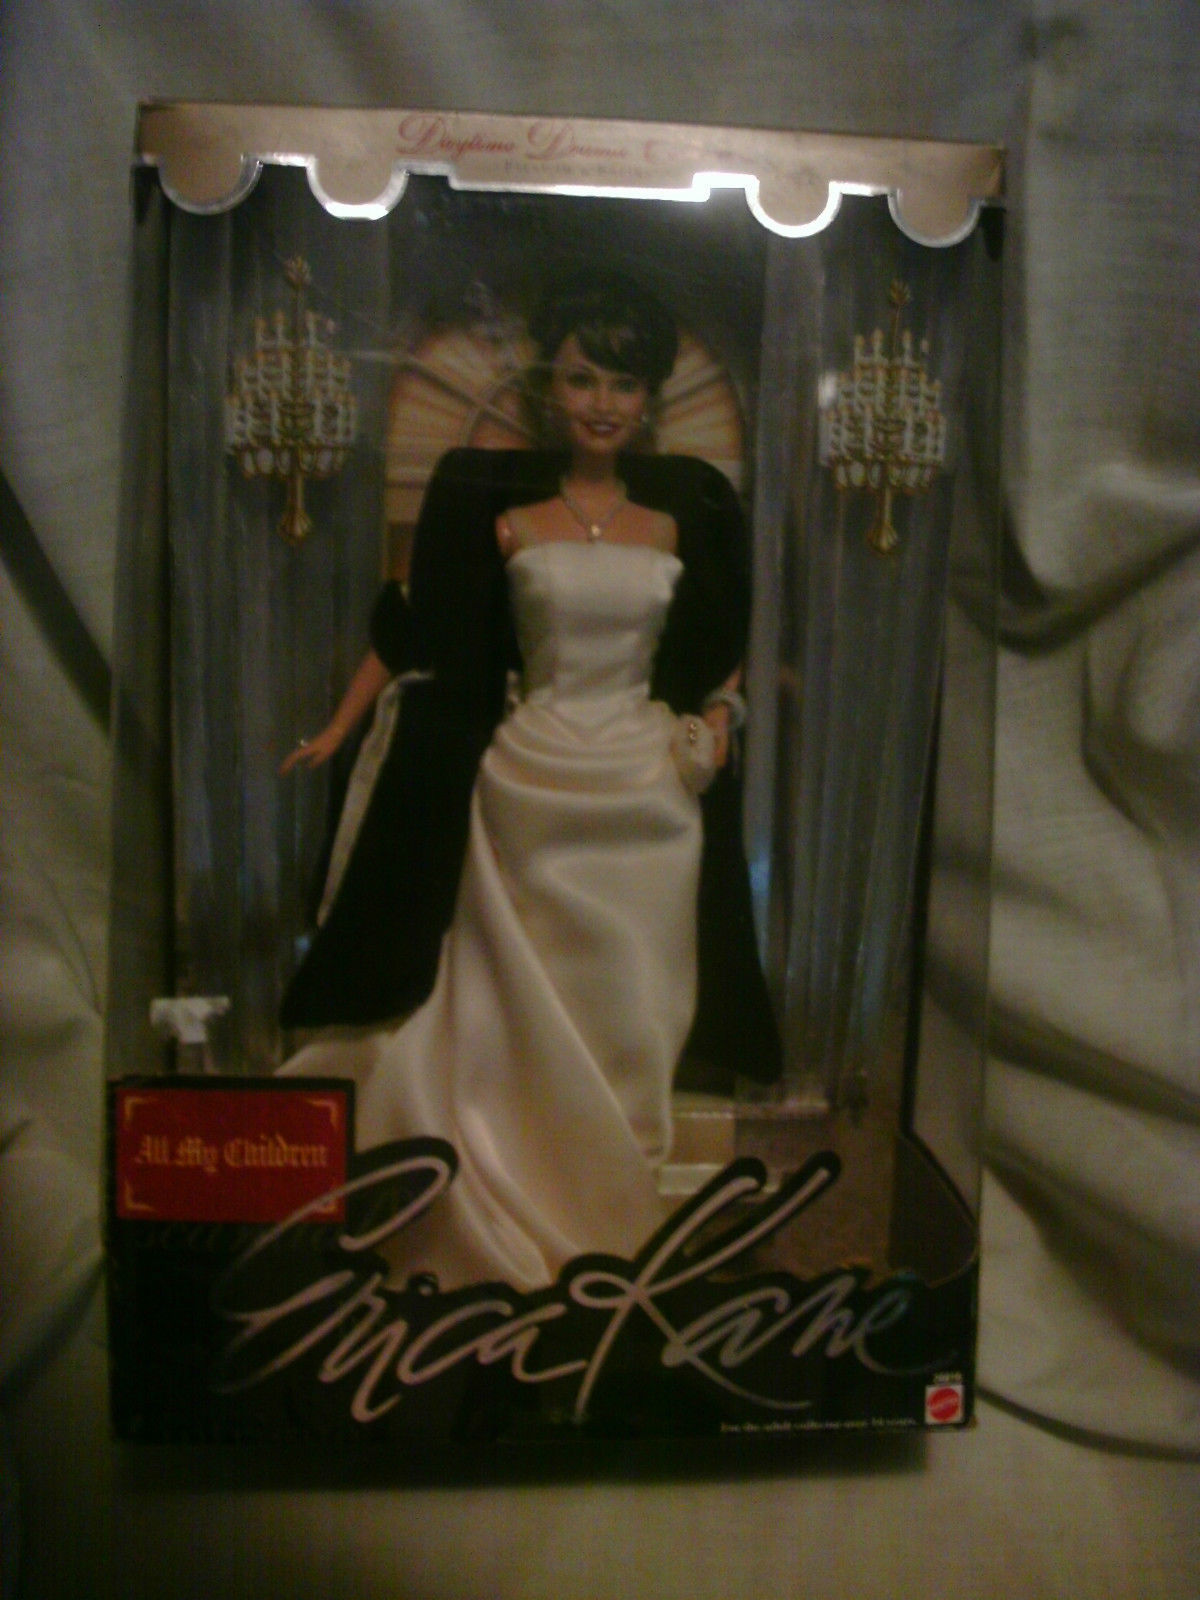 Erica Kane Doll All My Children 1998 Mattel